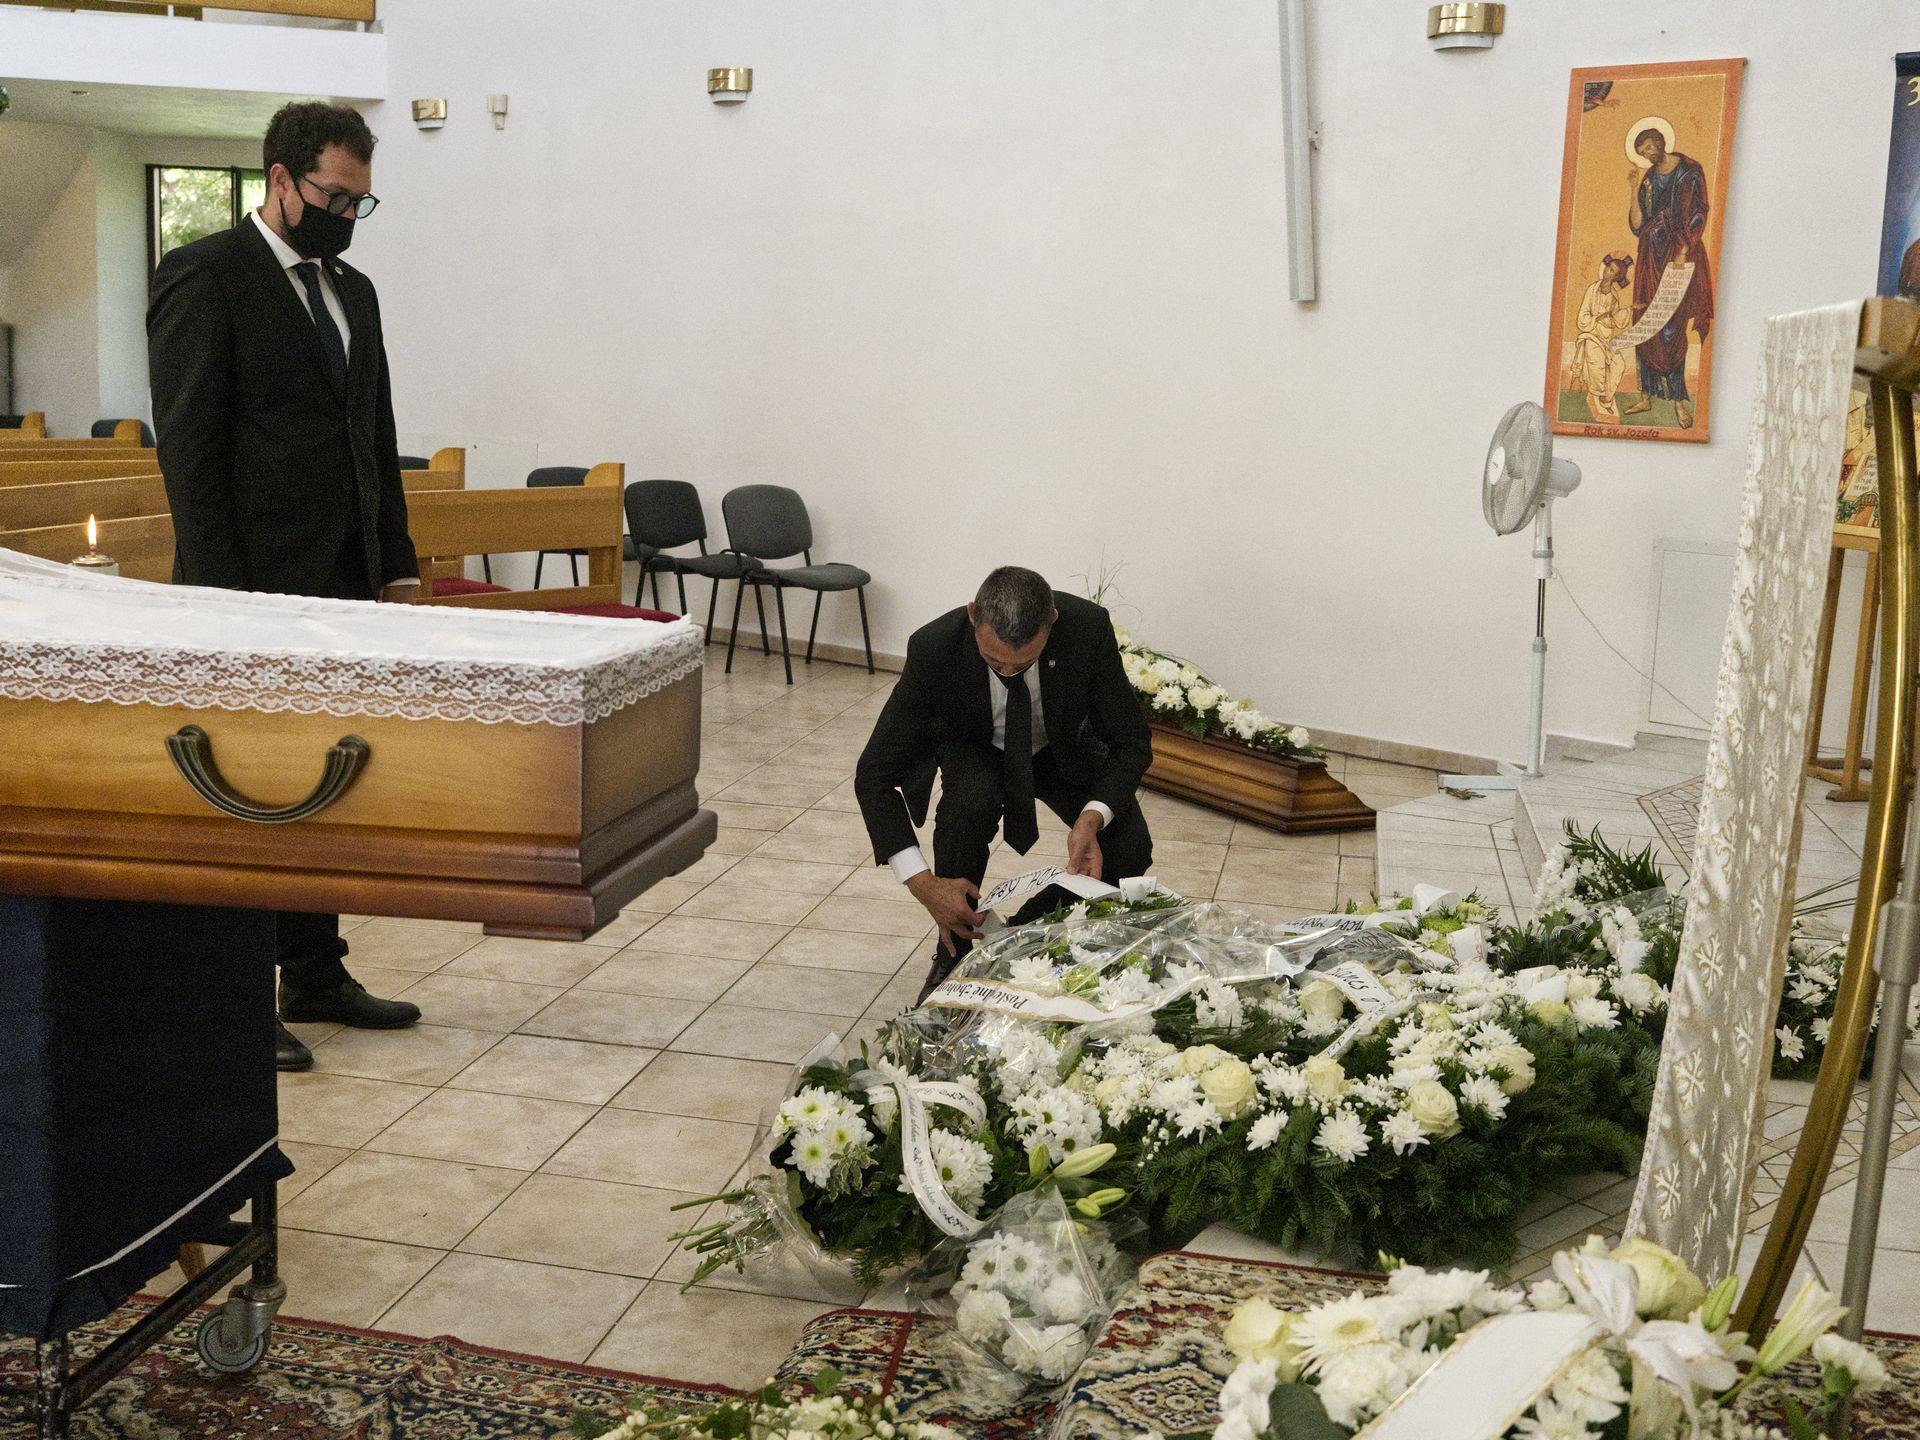 PohrebMikulasCecko5